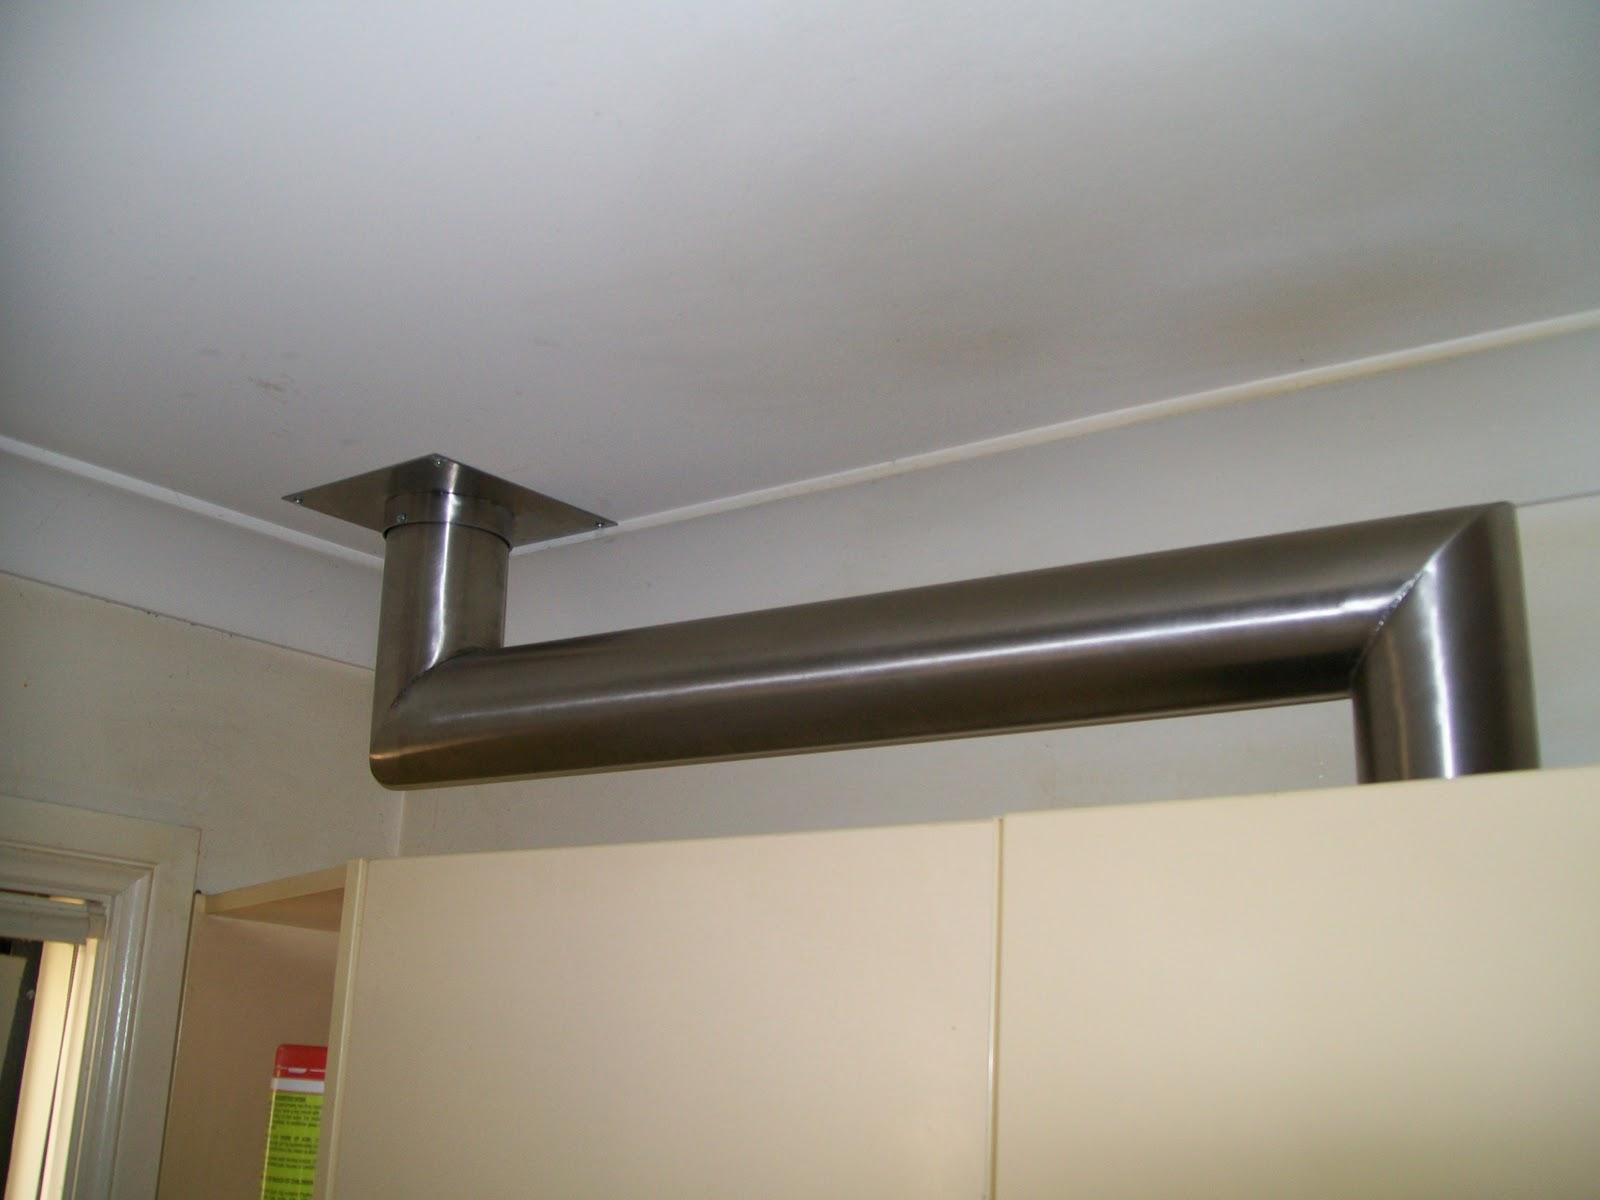 Hood Exhaust Pipe : Cropar pty ltd custom domestic rangehood exhaust pipe